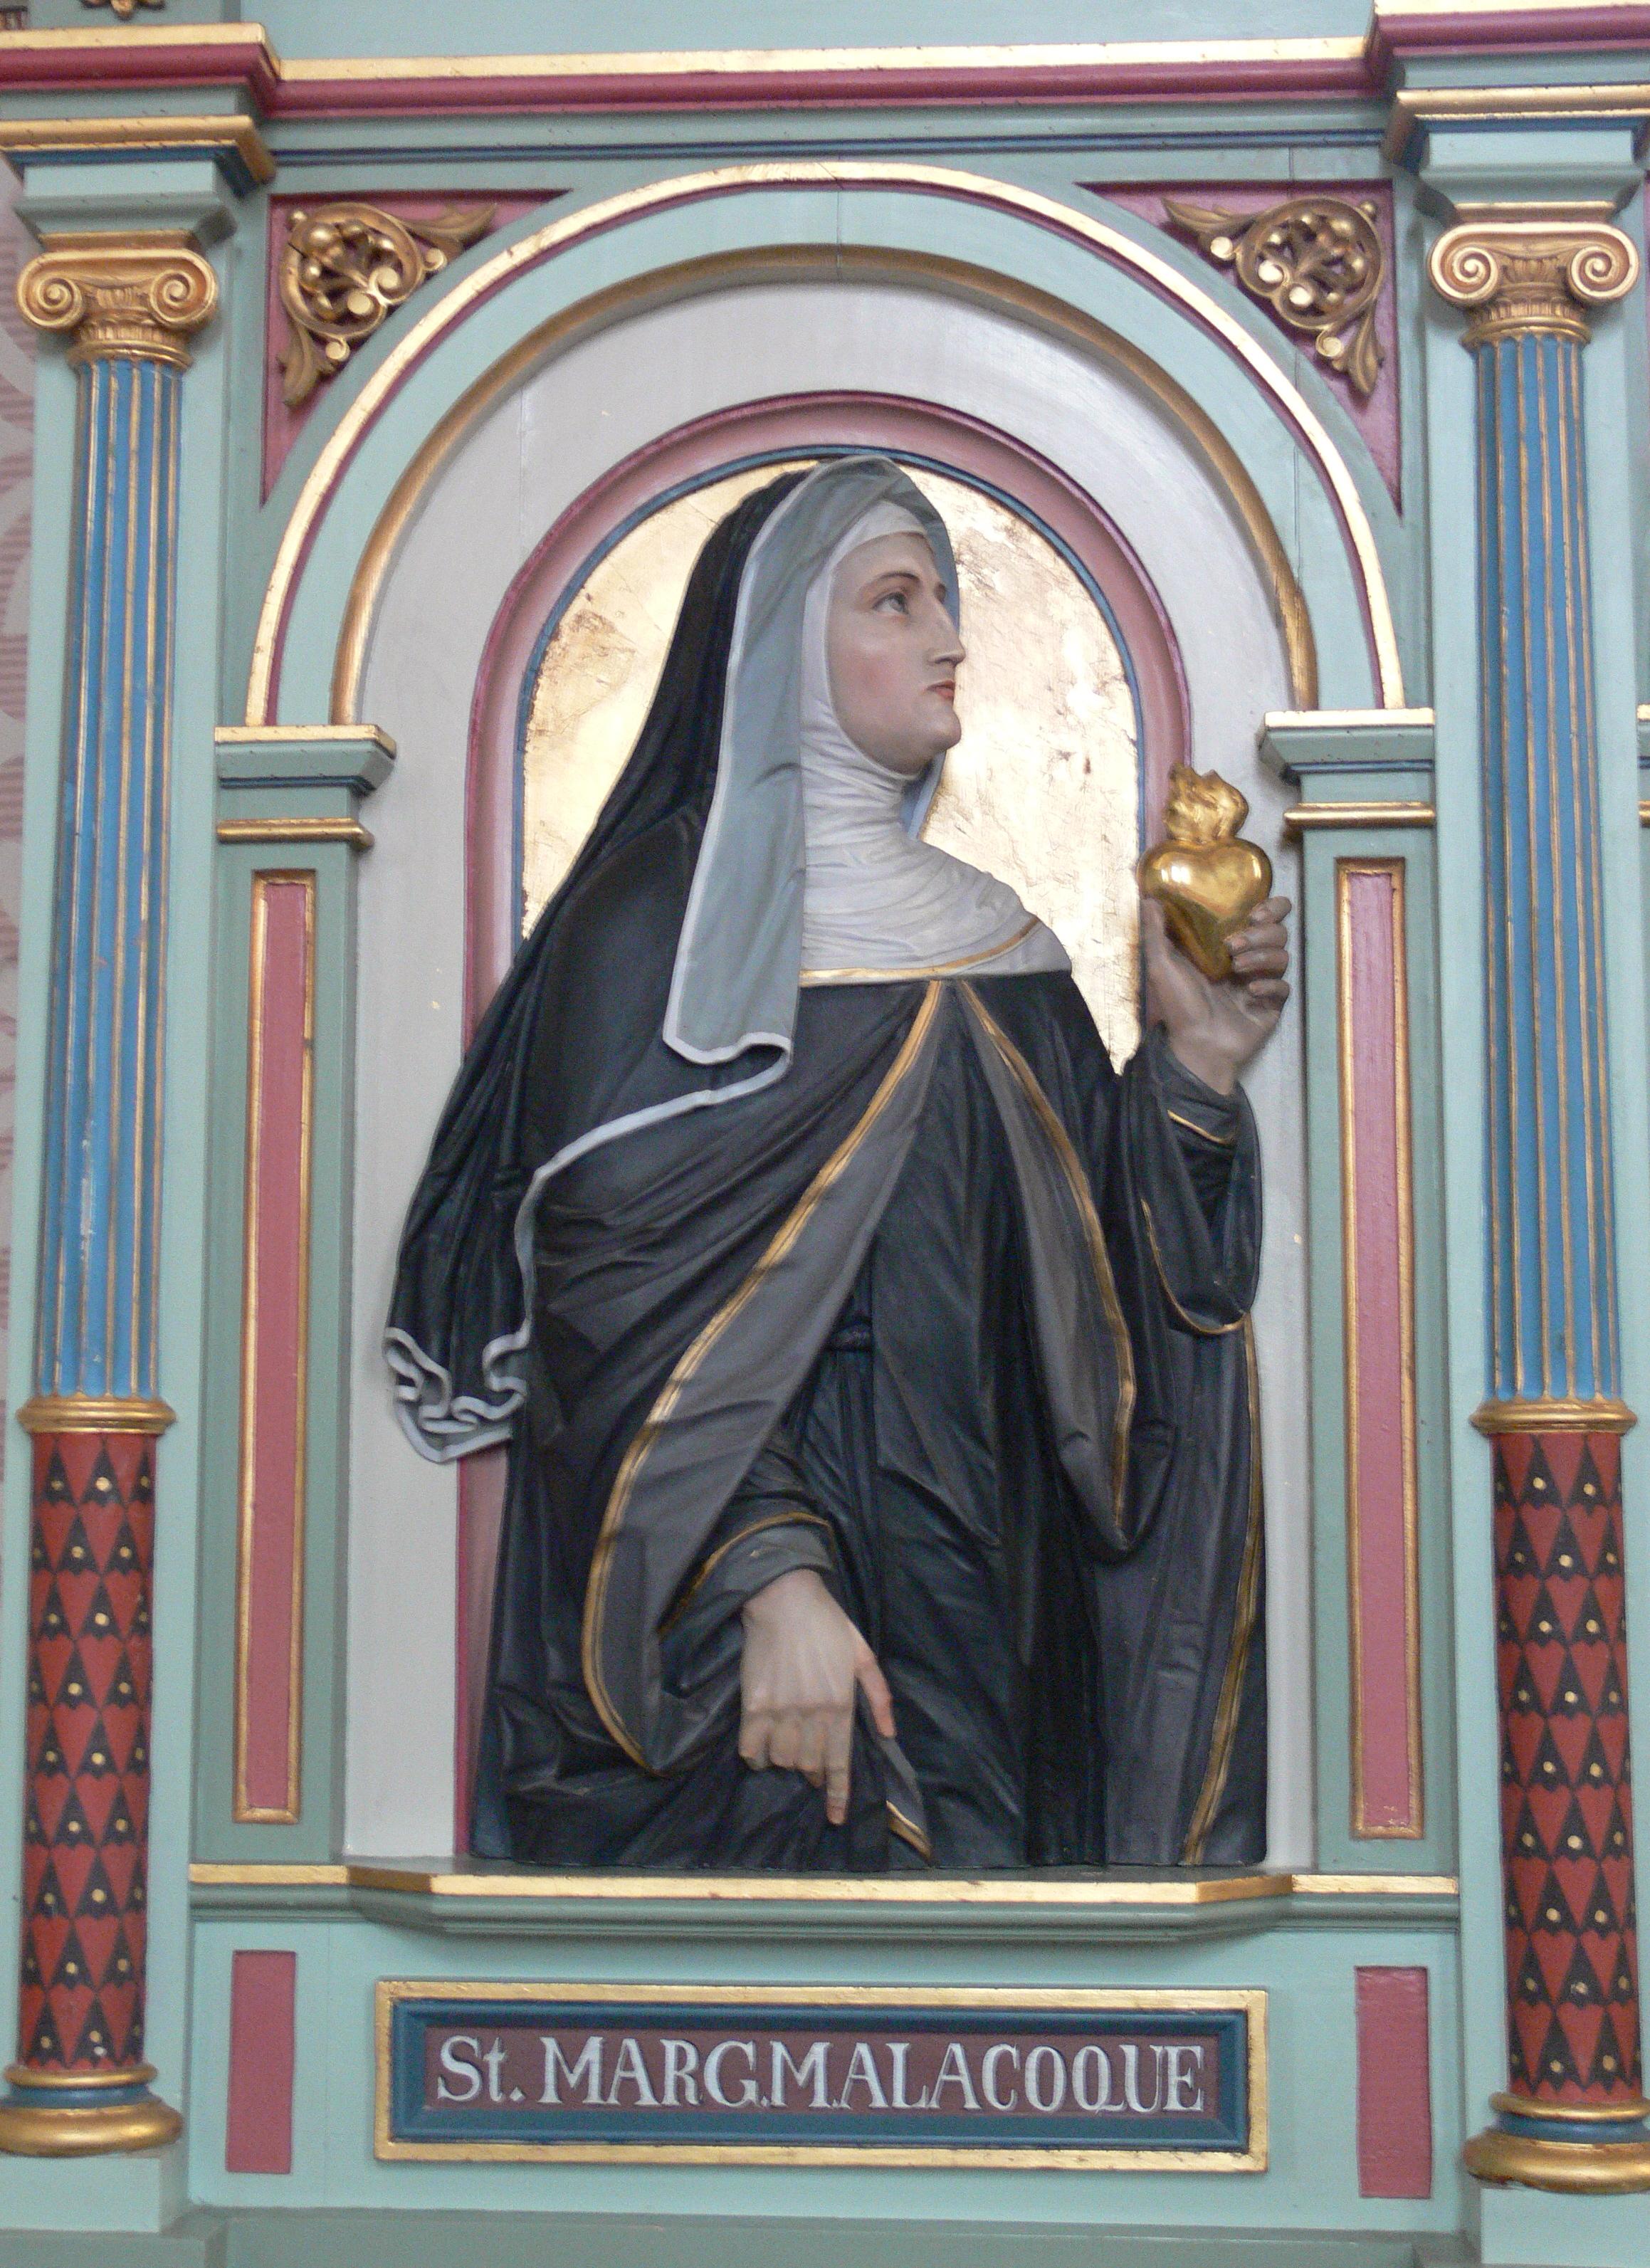 Merazhofen_Pfarrkirche_Chorgestühl_links_Margaretha_Maria_Alacoque